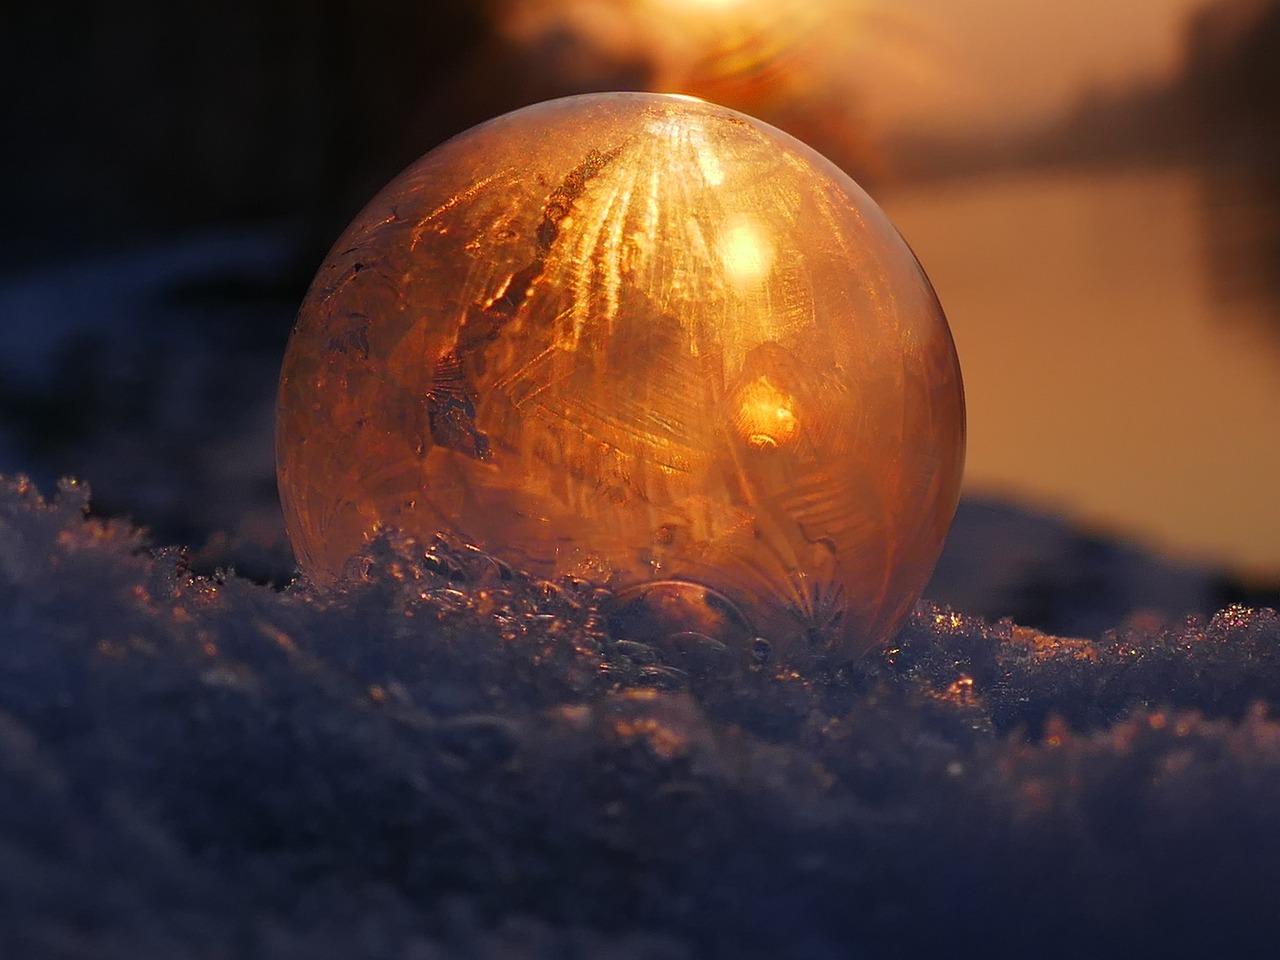 Stagg Strange Lights Globe Of Souls